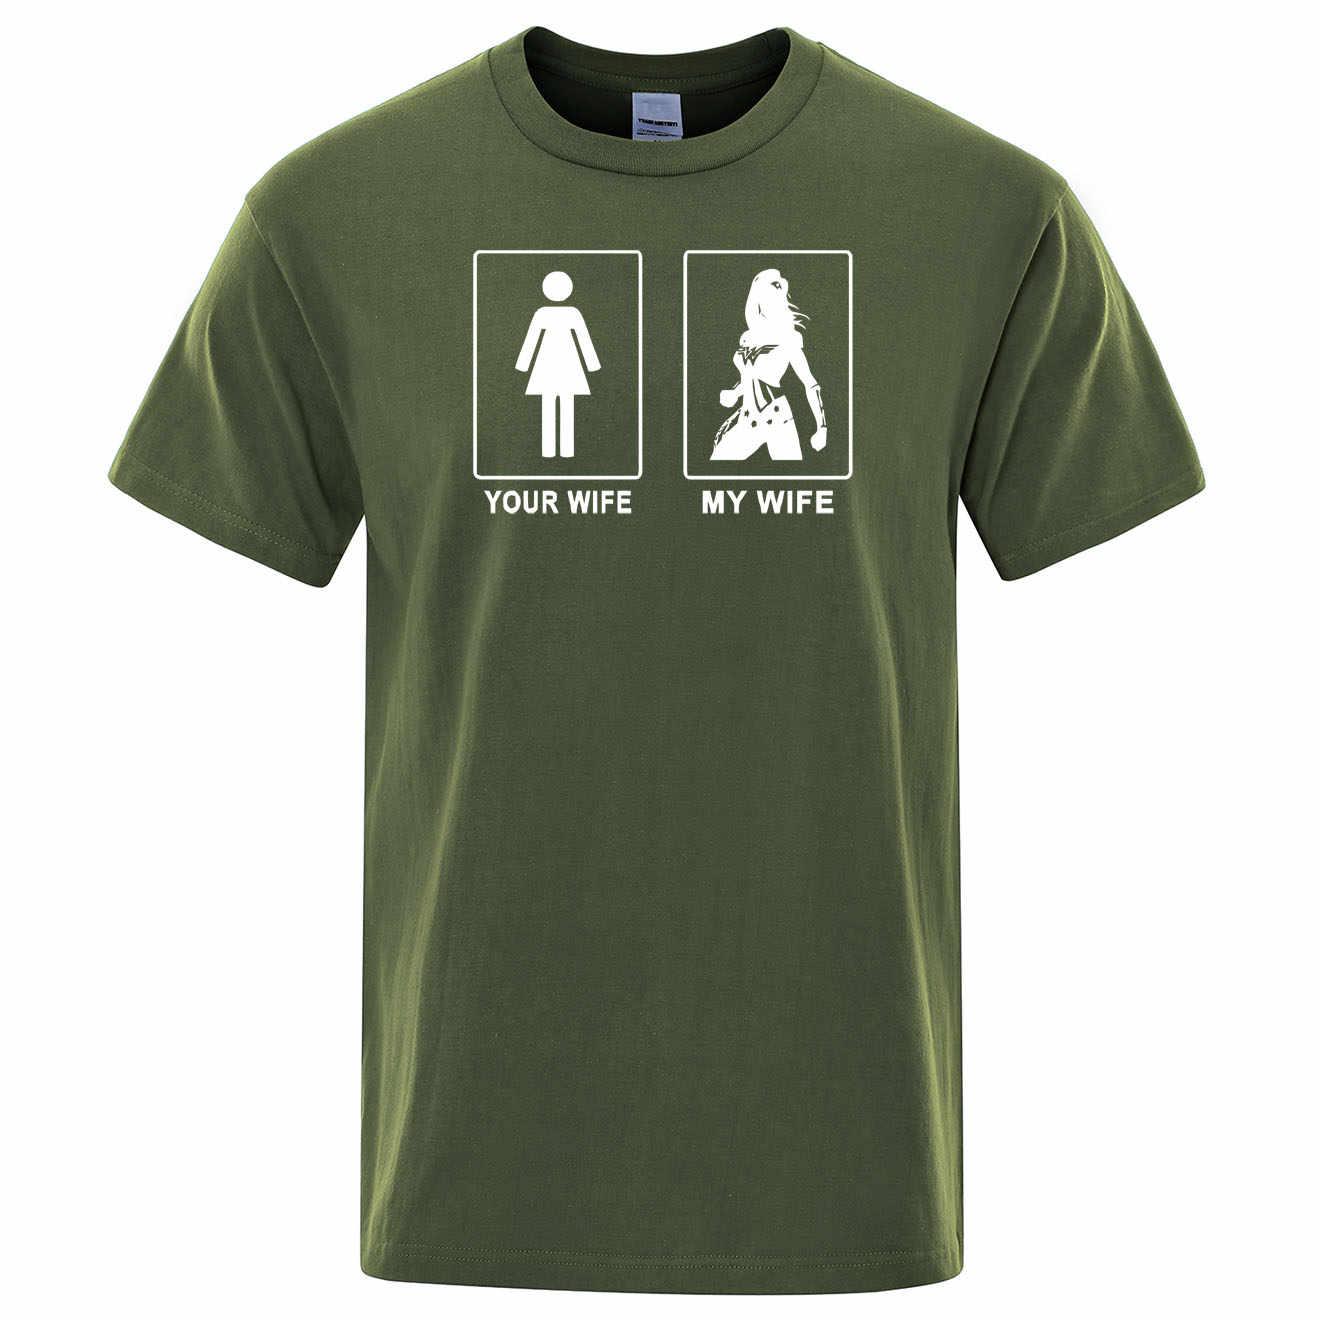 Wonder Woman Gal Gadot Mia Moglie Tua Moglie T-Shirt Cotone di Estate T Shirt Mens Punk Rock Supereroe Magliette E Camicette di Stampa Divertente tee Shirt